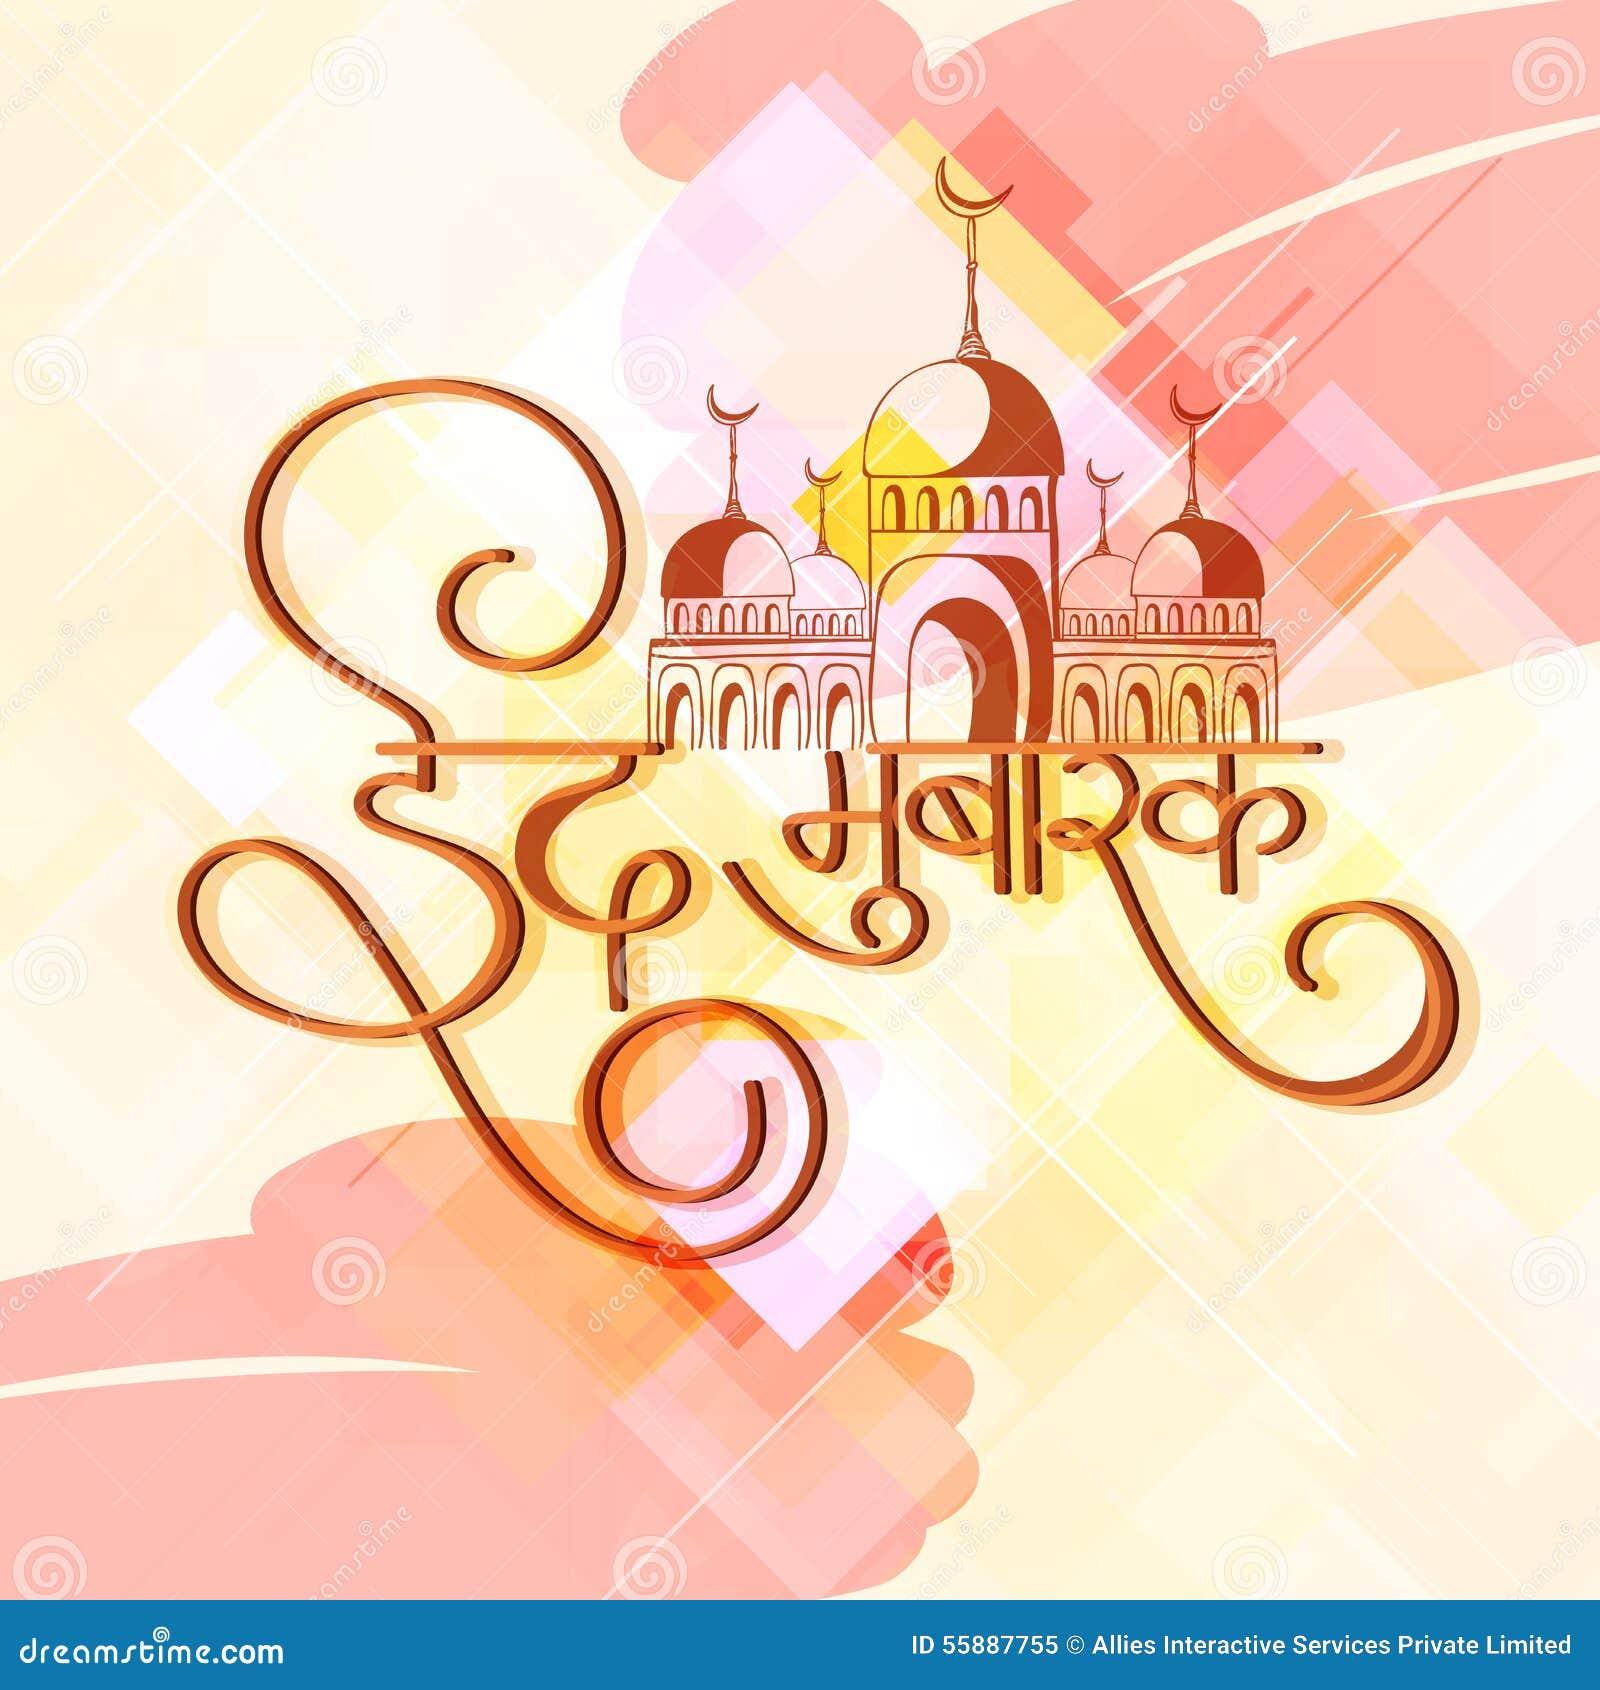 Fantastic Hindi Eid Al-Fitr Greeting - greeting-card-mosque-eid-celebration-elegant-design-hindi-wishing-text-mubarak-happy-abstract-background-islamic-holy-55887755  Image_18832 .jpg